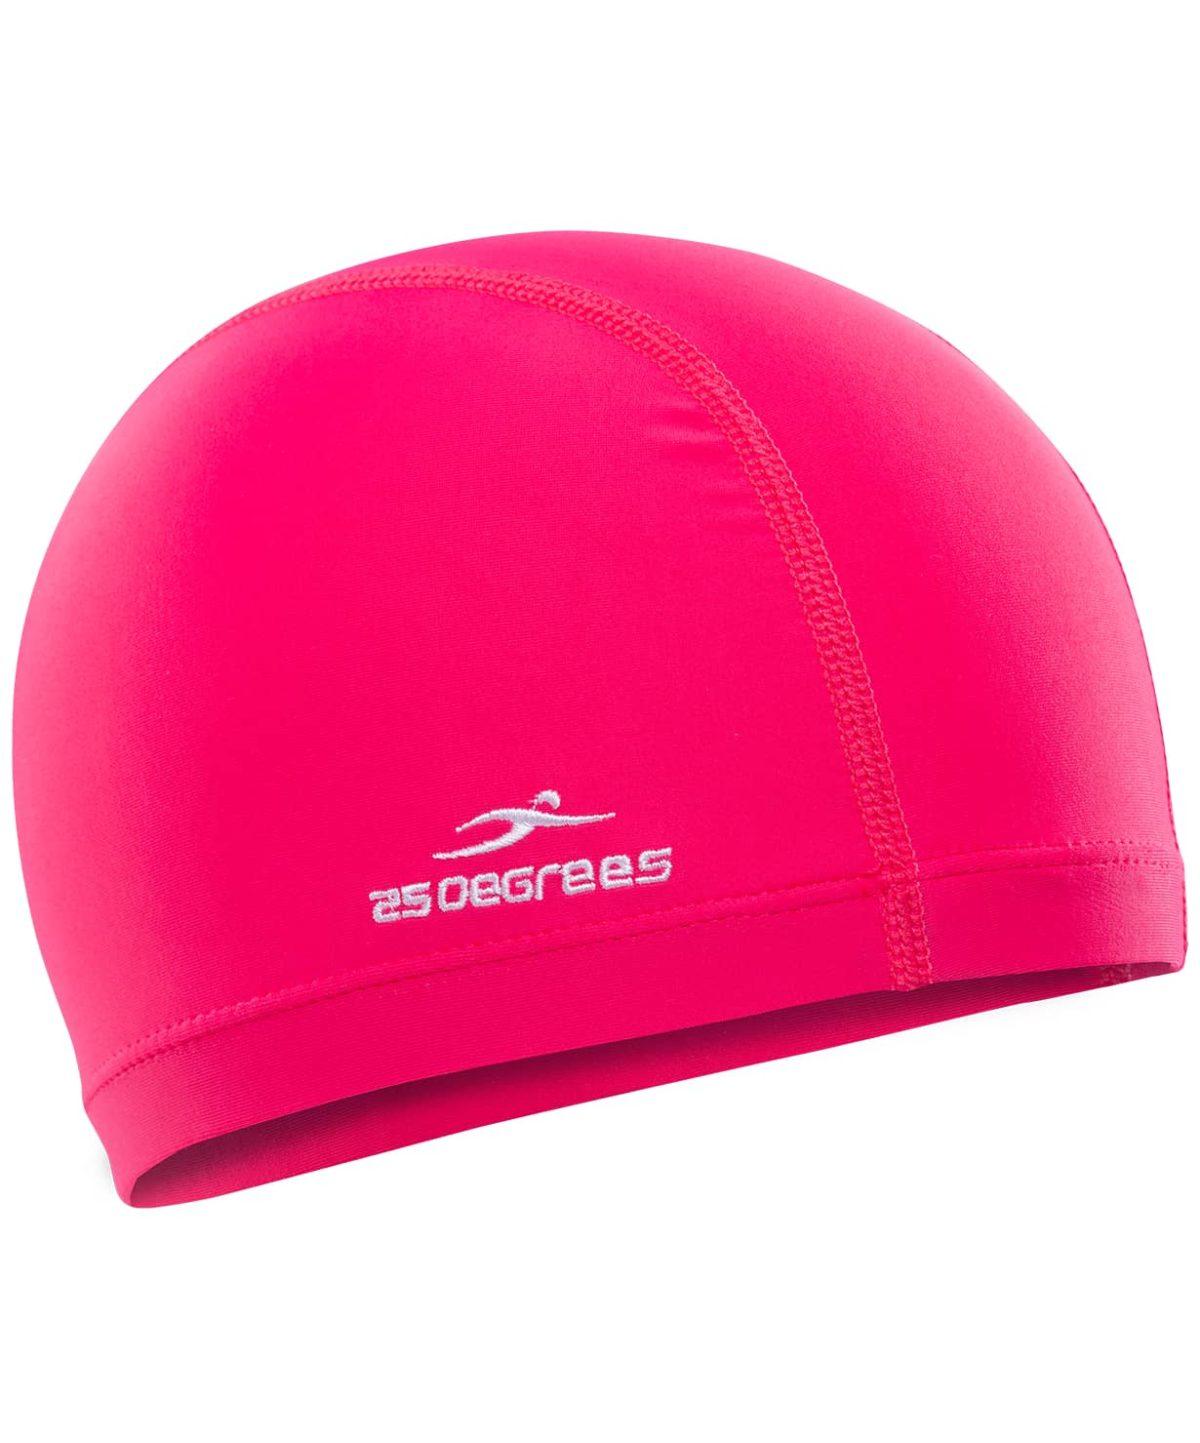 25DEGREES Шапочка для плавания Essence, полиамид 25D15-ES-22-32: розовый - 1